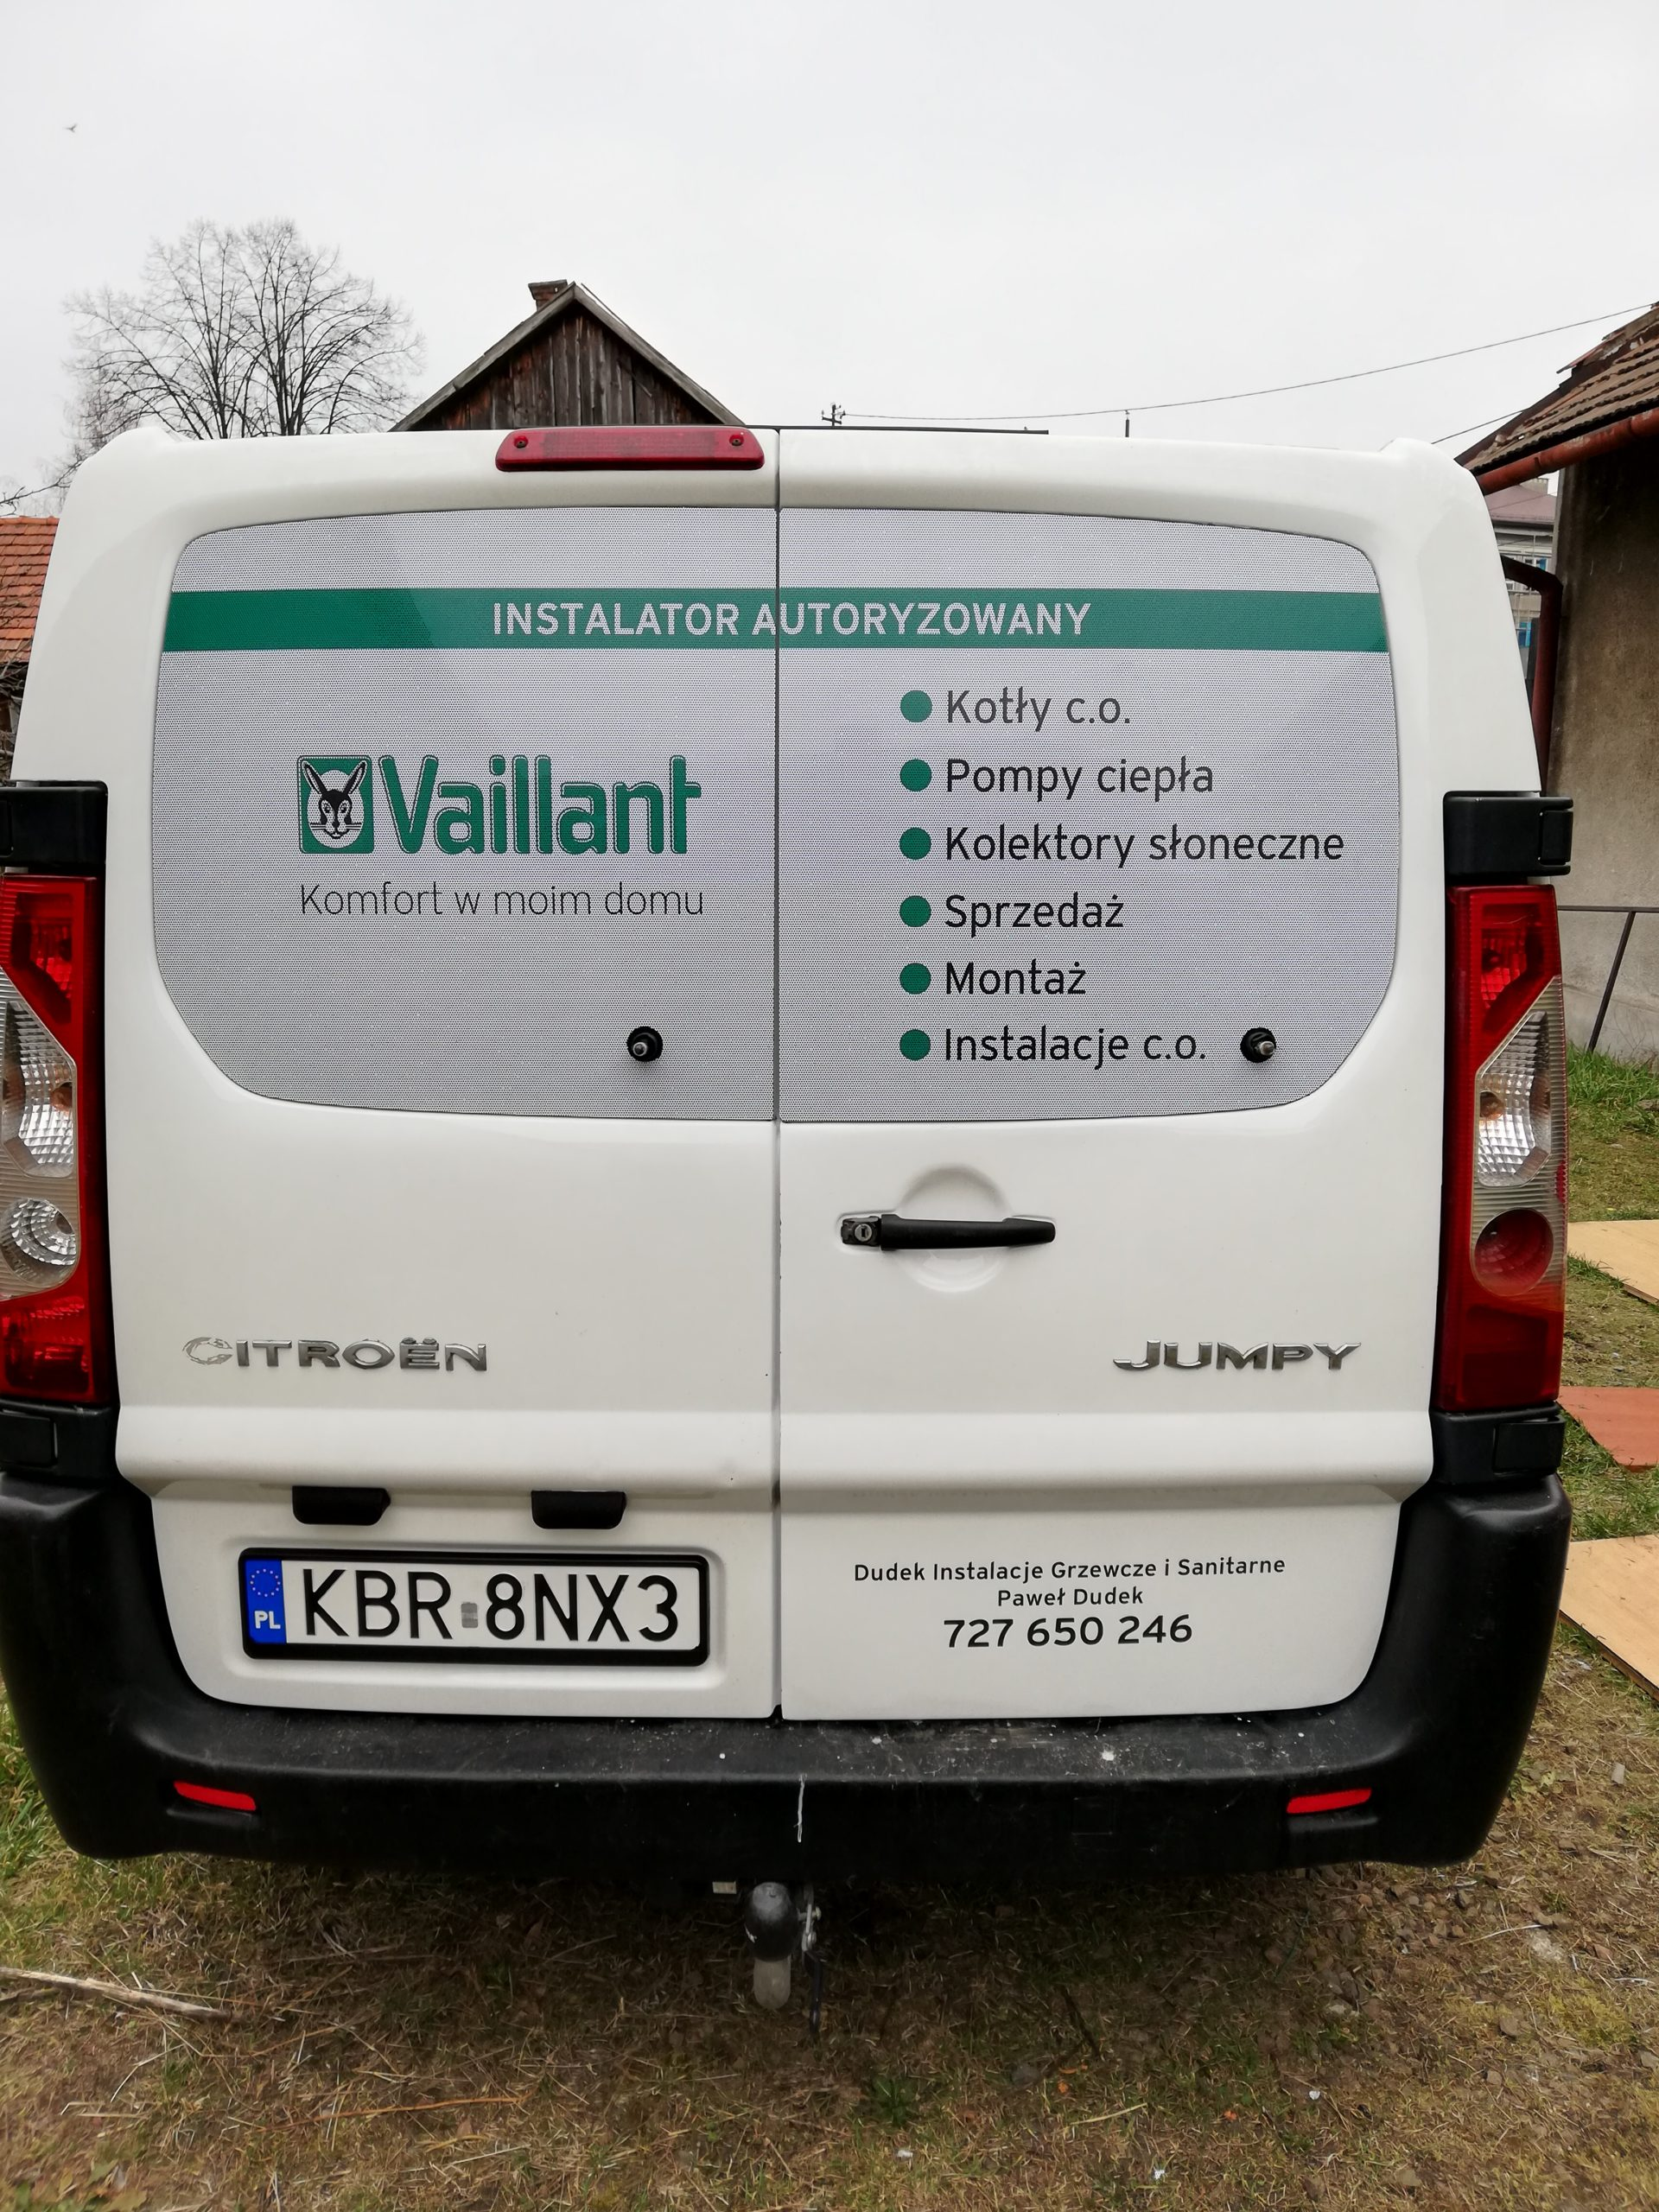 Realizacja reklamy Vaillant